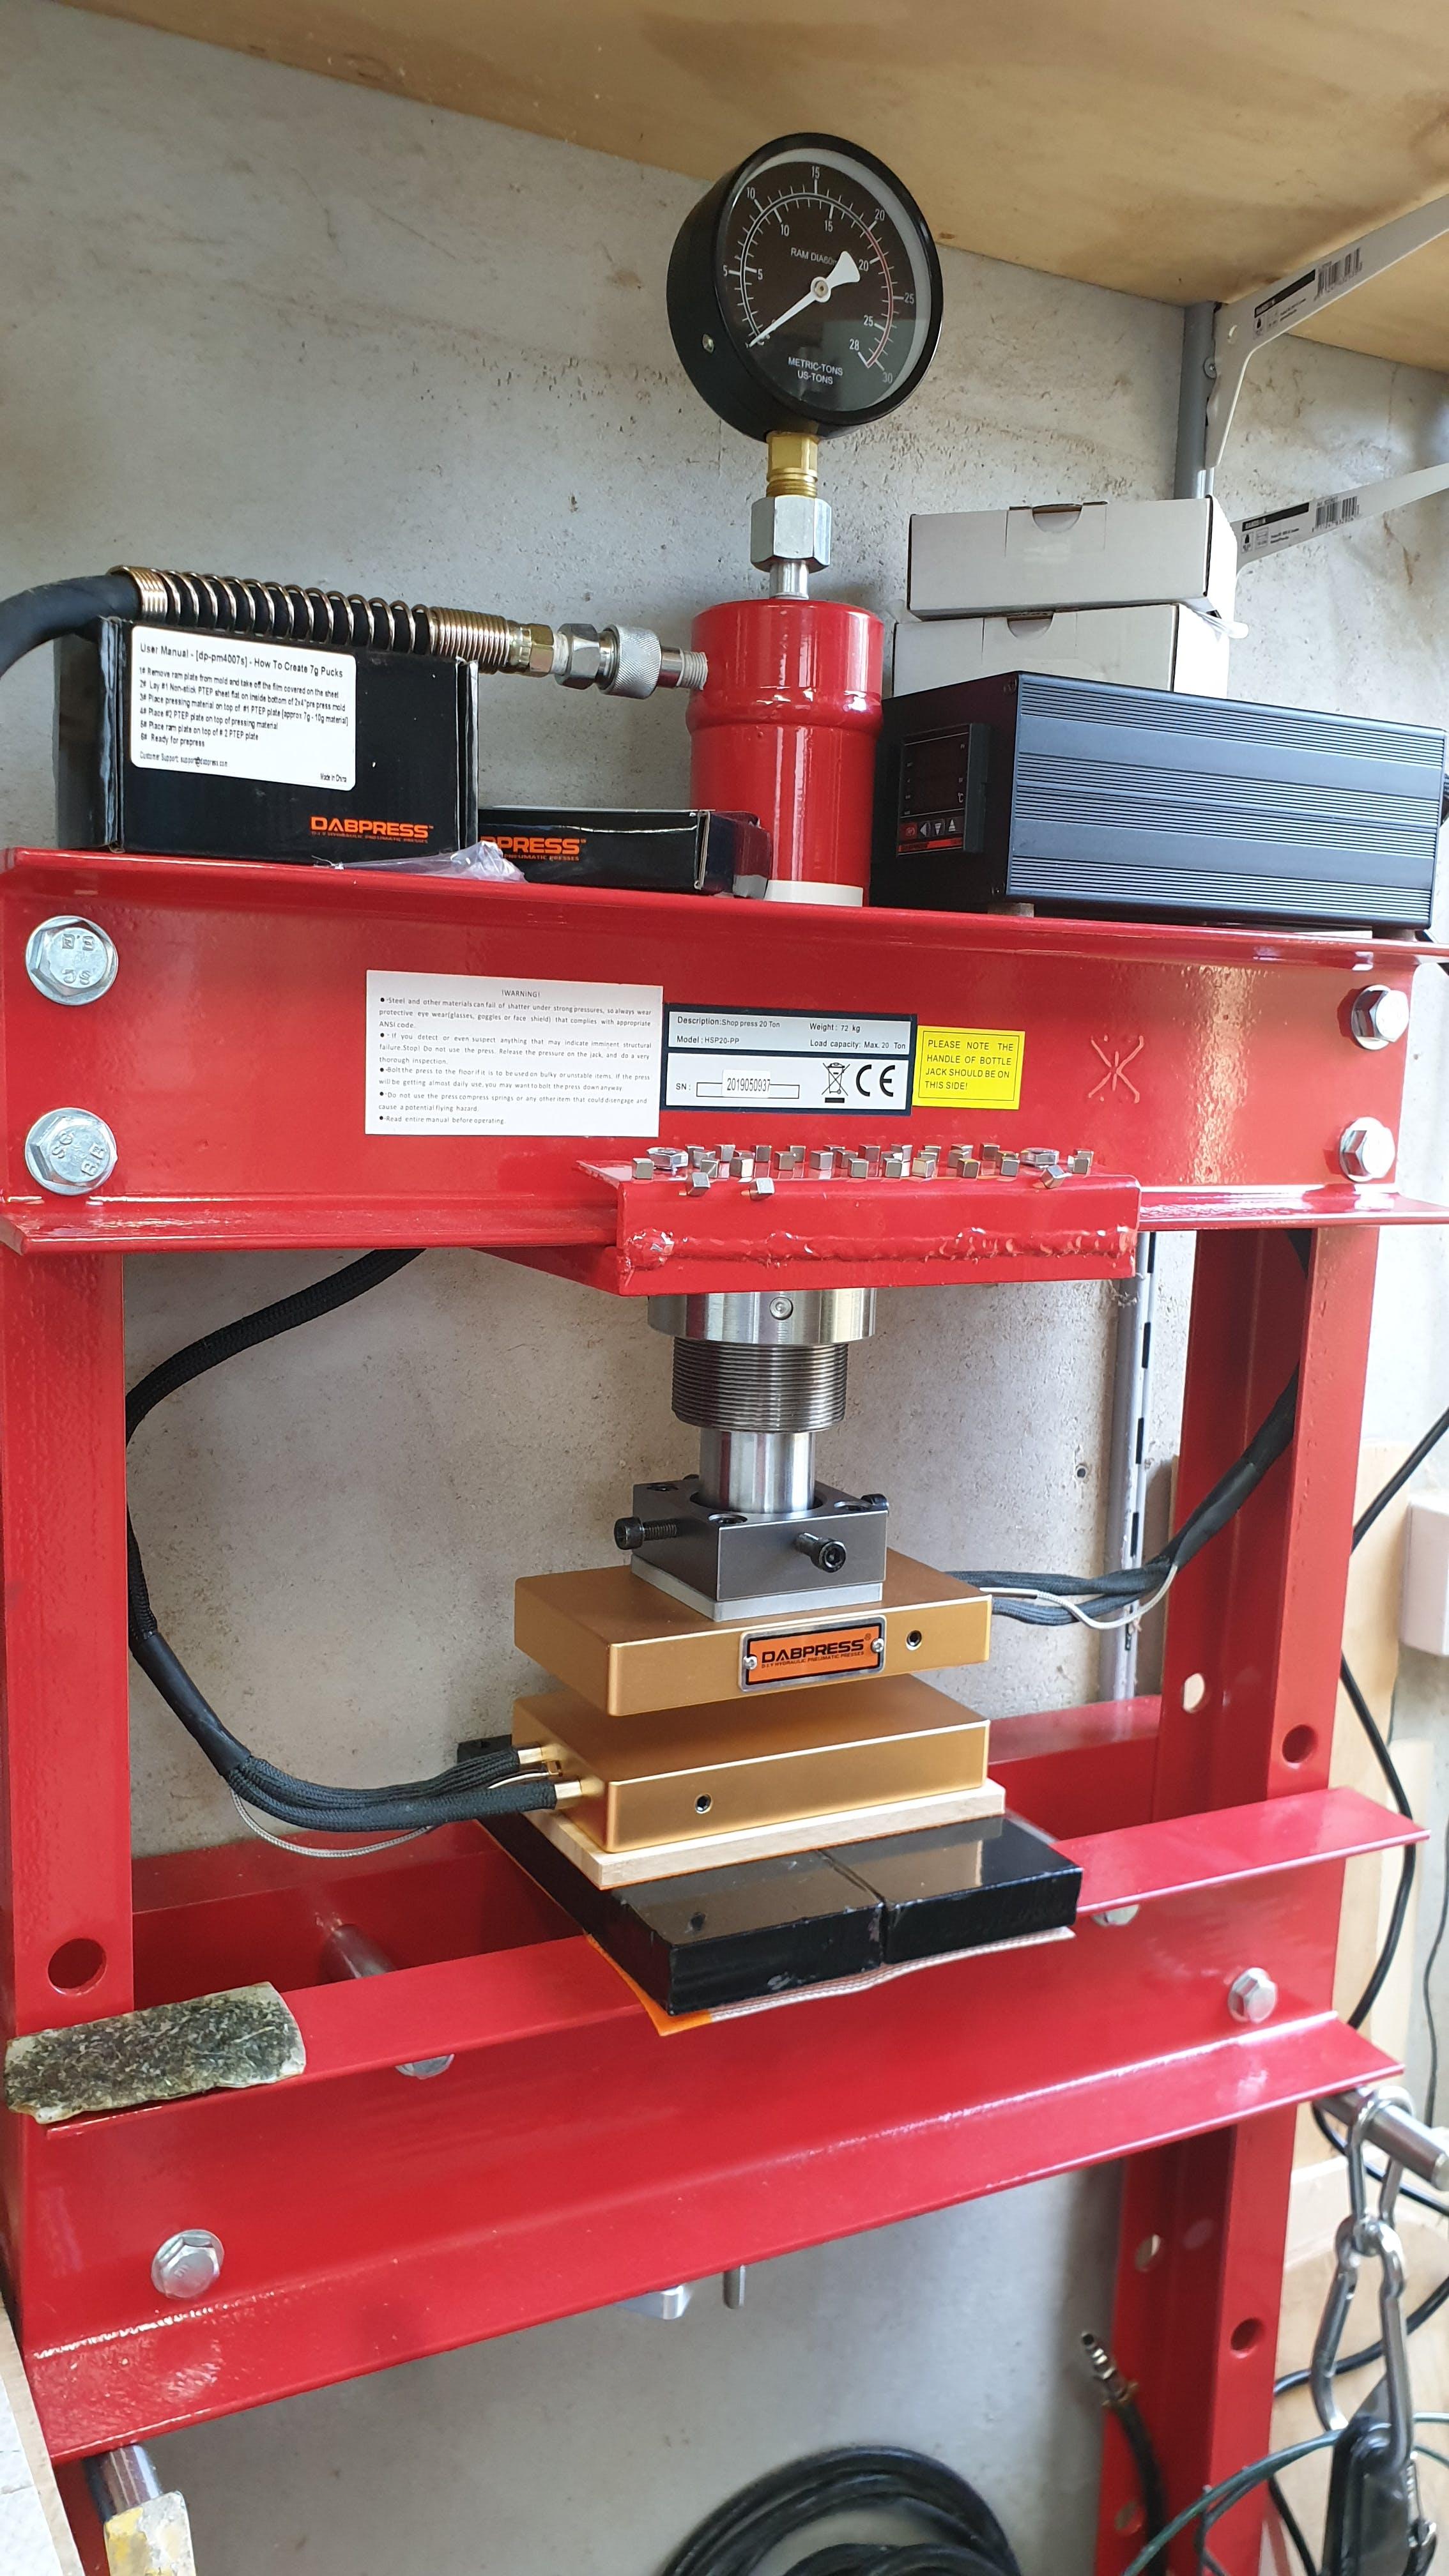 New 4x7 DIY Uncaged Press Plates Kit - 1,200 Watts - Build up 20-30 Ton  Hydraulic Rosin Press